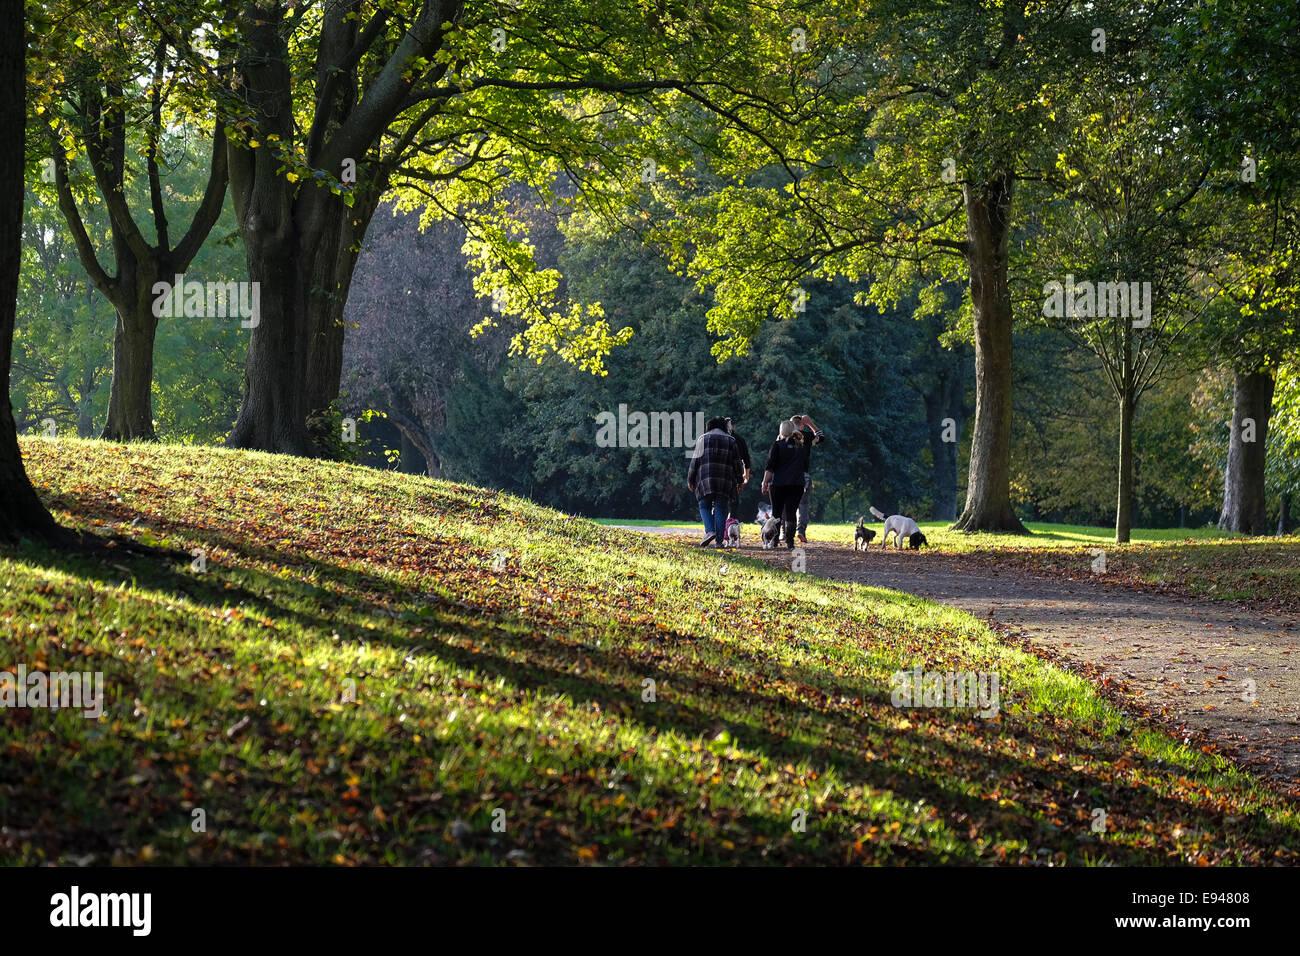 Family walking their dog through an autumnal park path - Stock Image